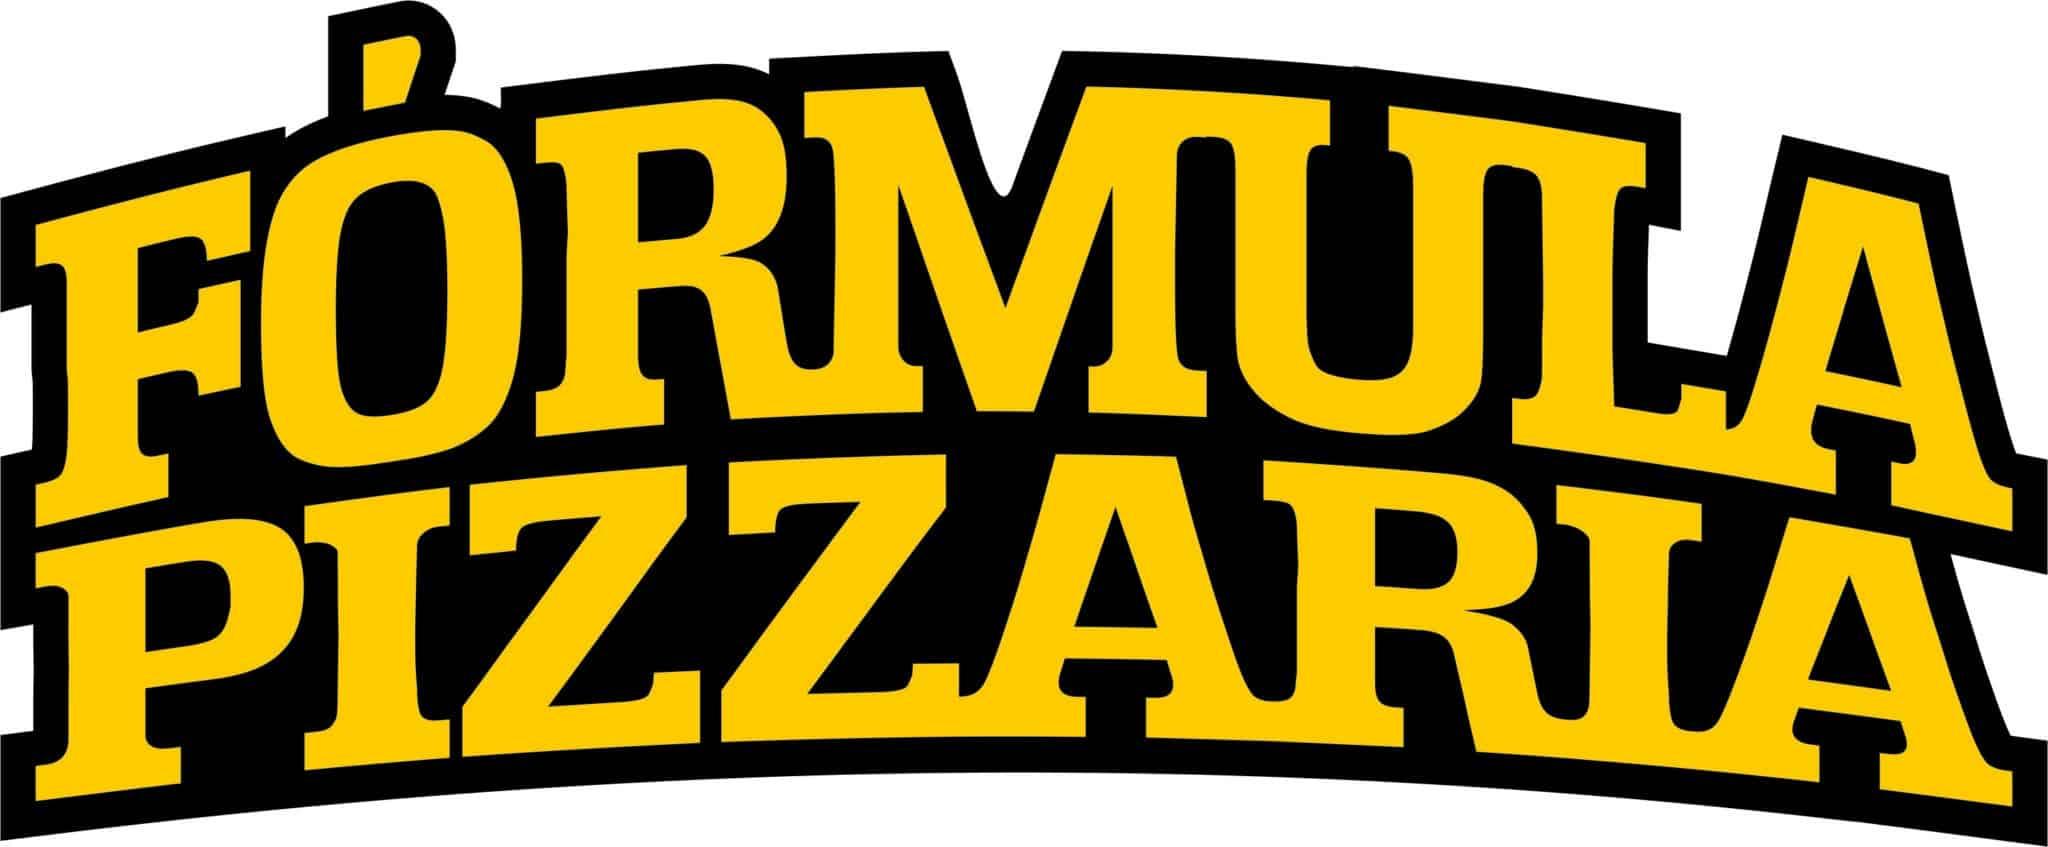 logo formula pizzaria